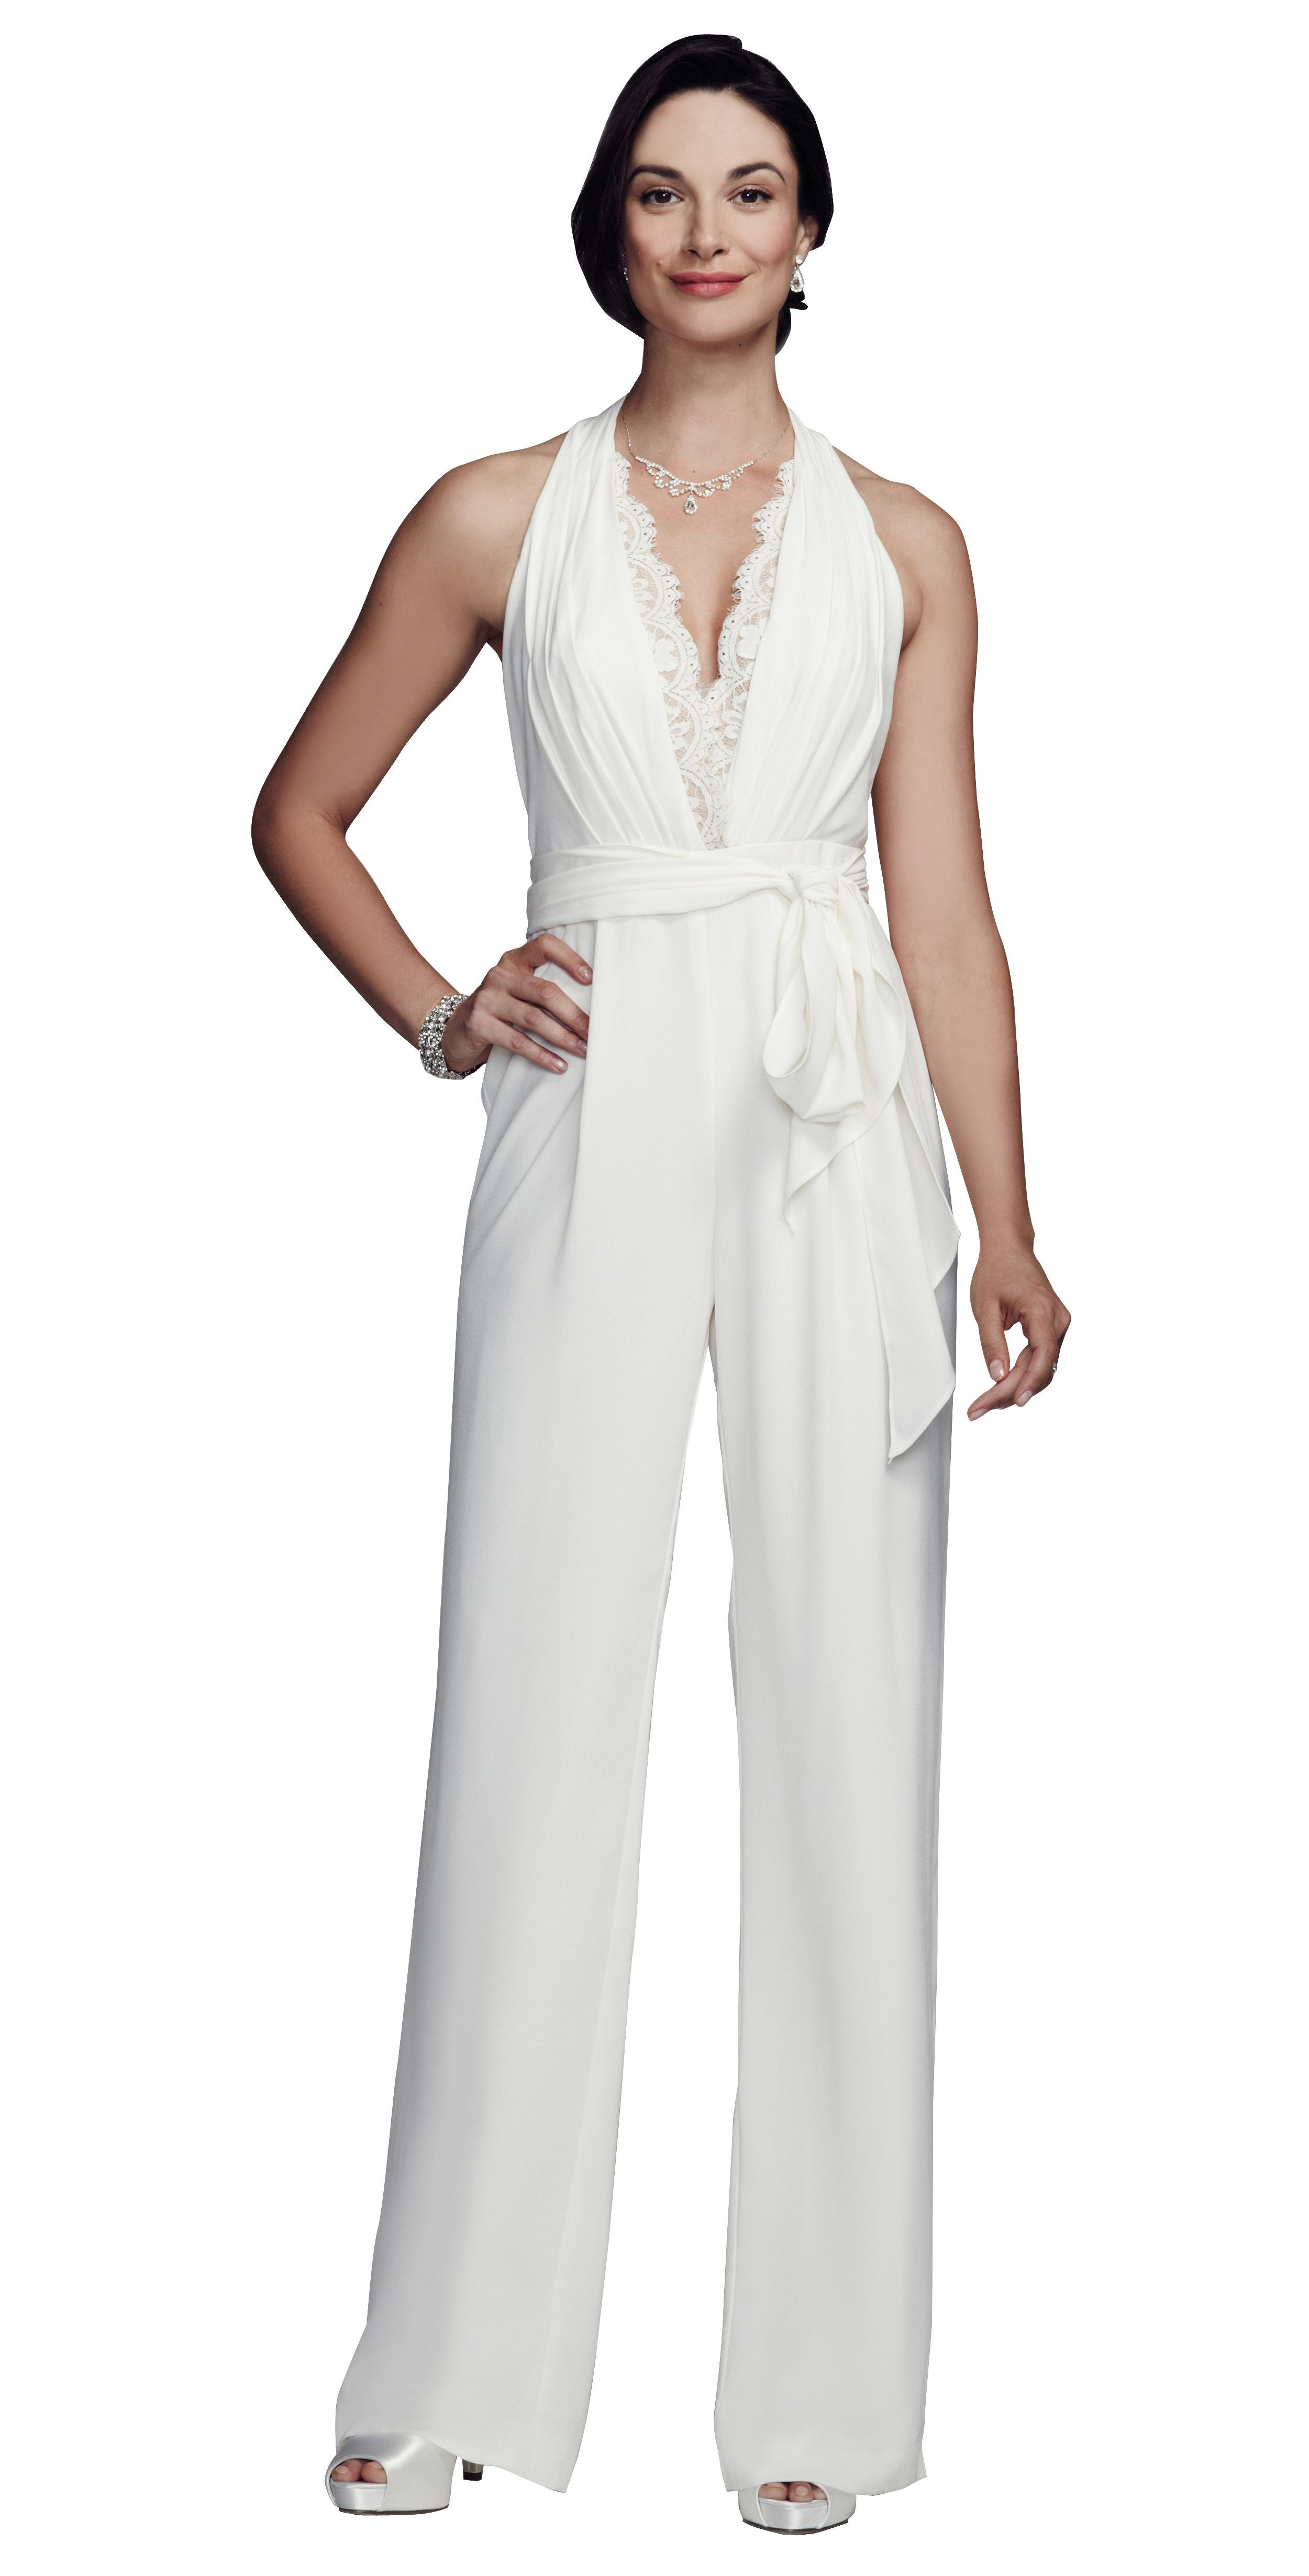 jumpsuits at david's bridal Shop Clothing & Shoes Online